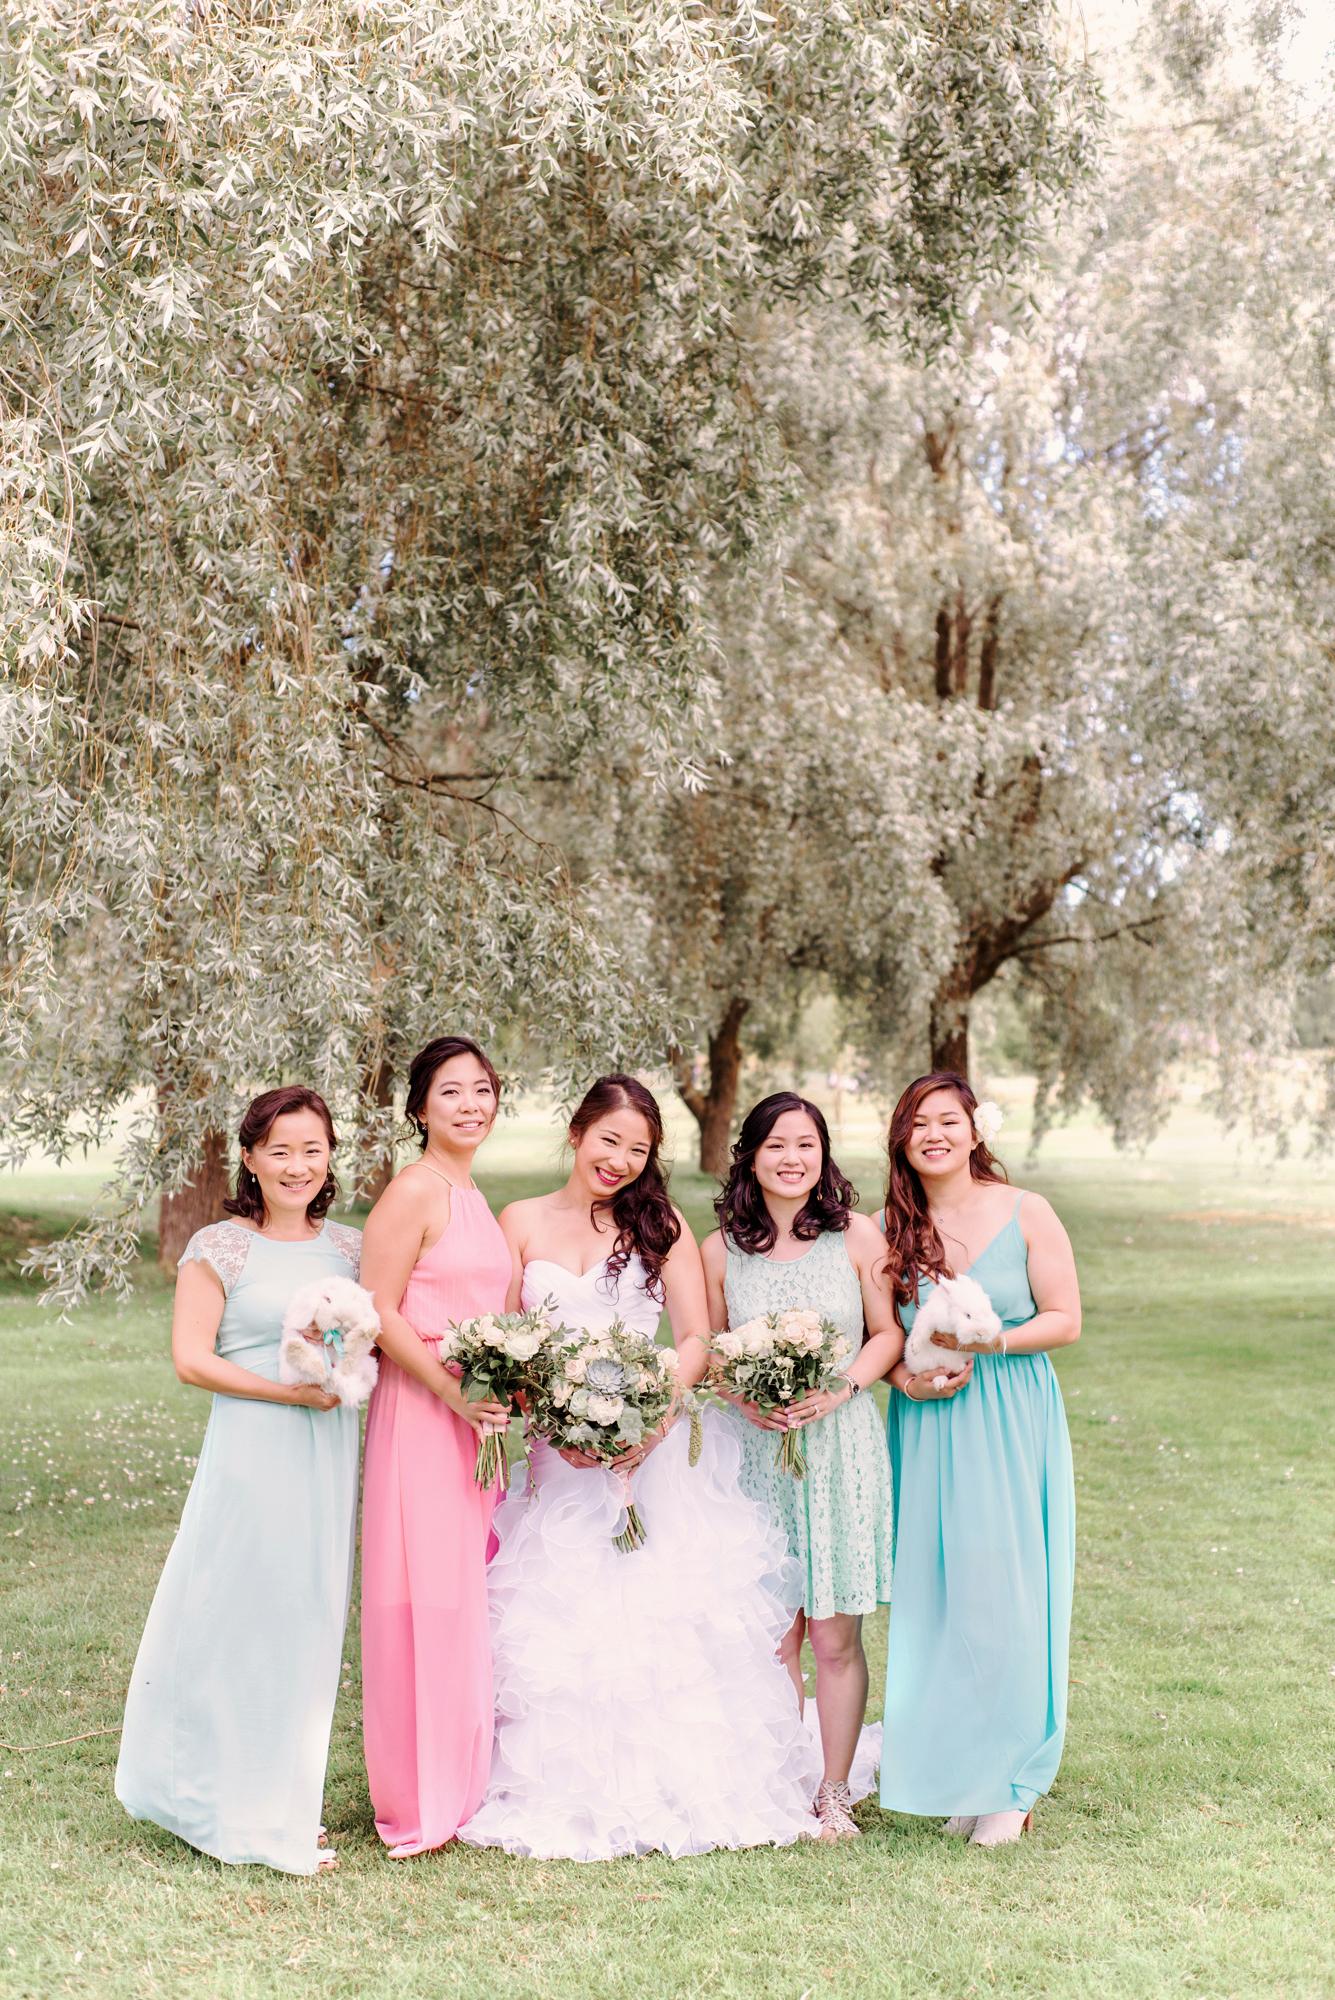 Guide to Perfectly Mismatched Bridesmaids DressesBröllopsfotograf Stockholm Umeå. Wedding photographer